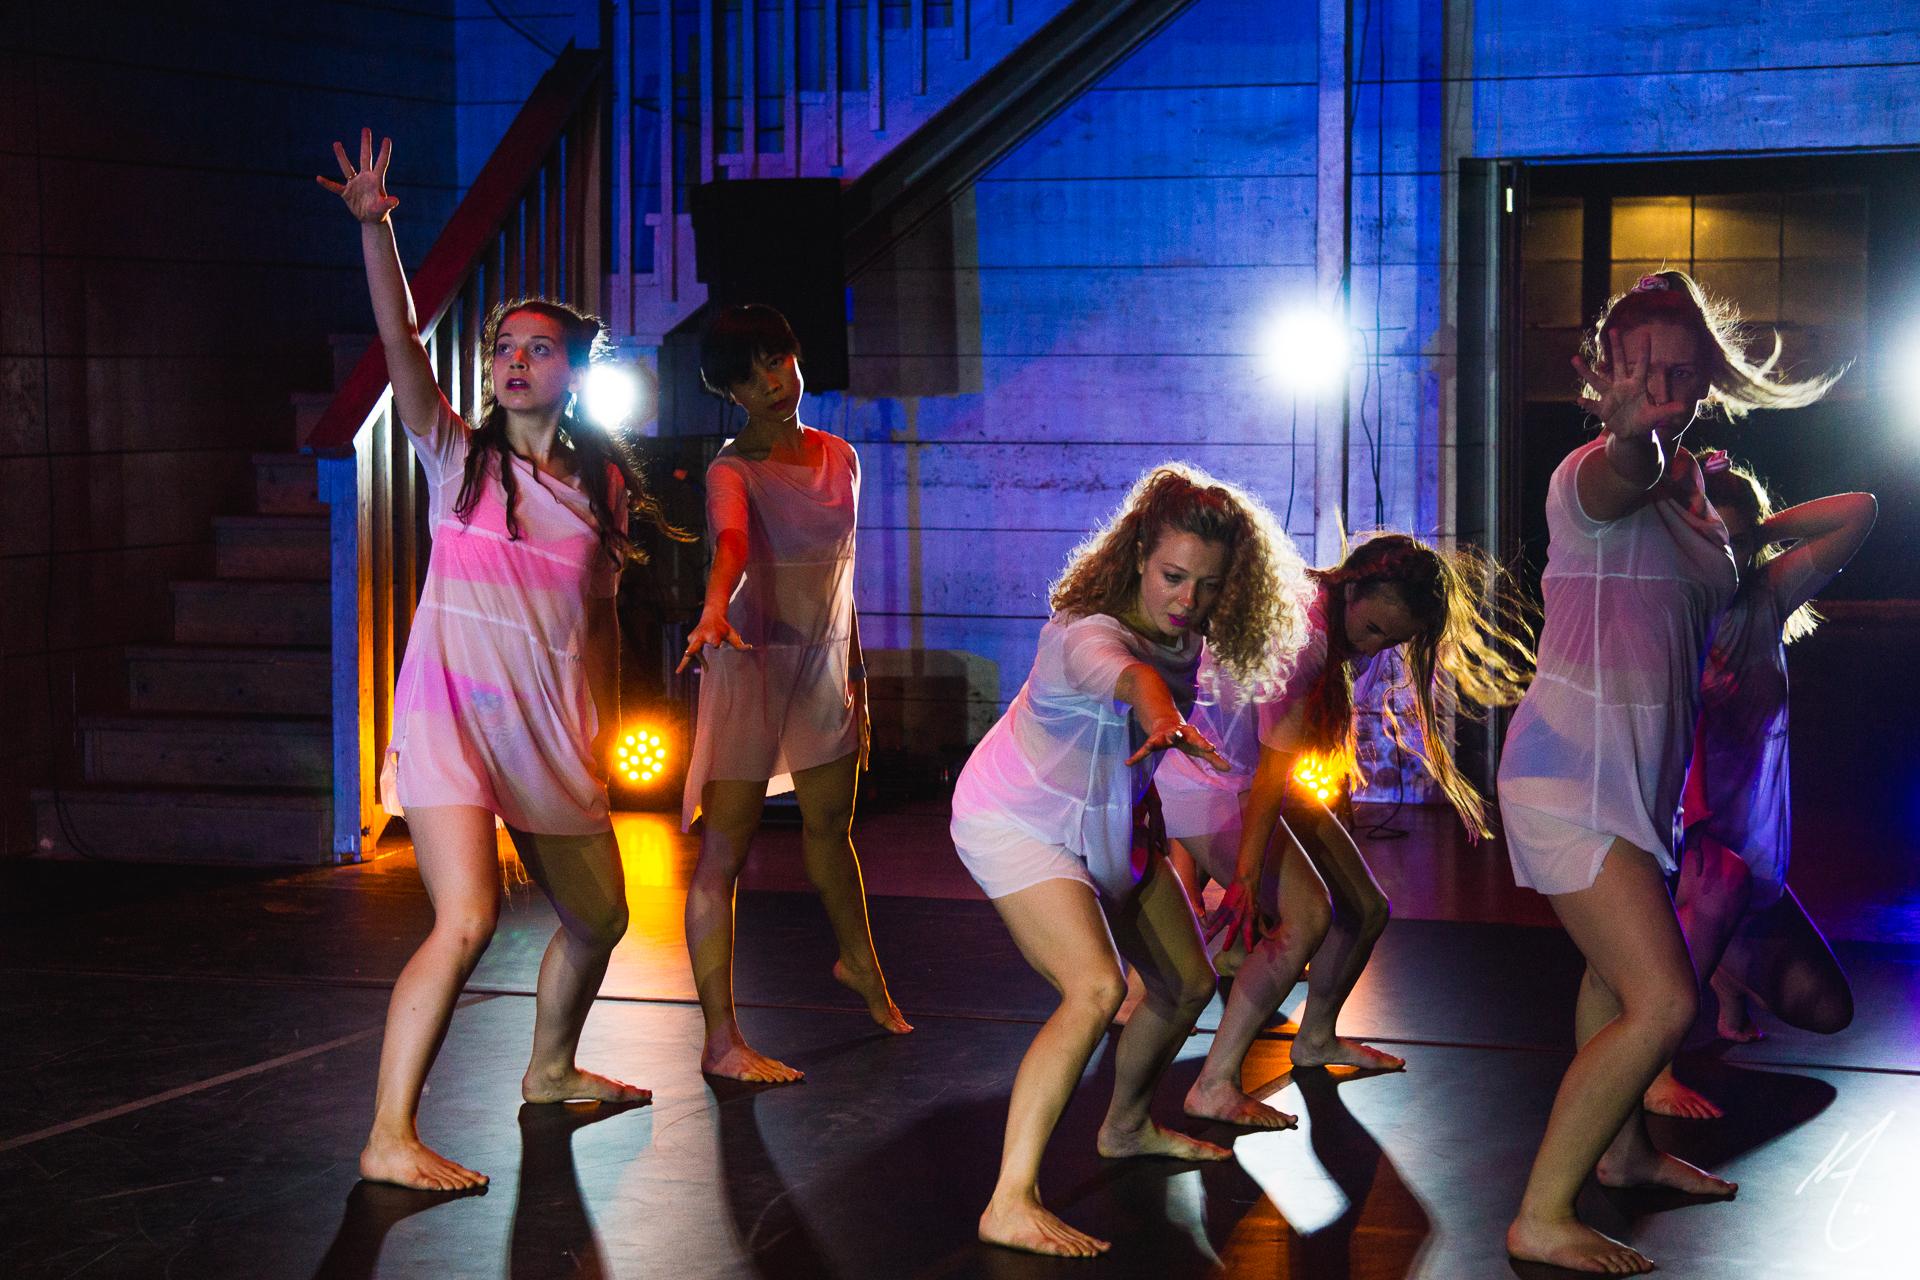 Dancers: Peyton Cunningham, Alexa Capareda, Hailley Laurèn, Katie Hopkins, Shanna Fragen, Lauren Parra